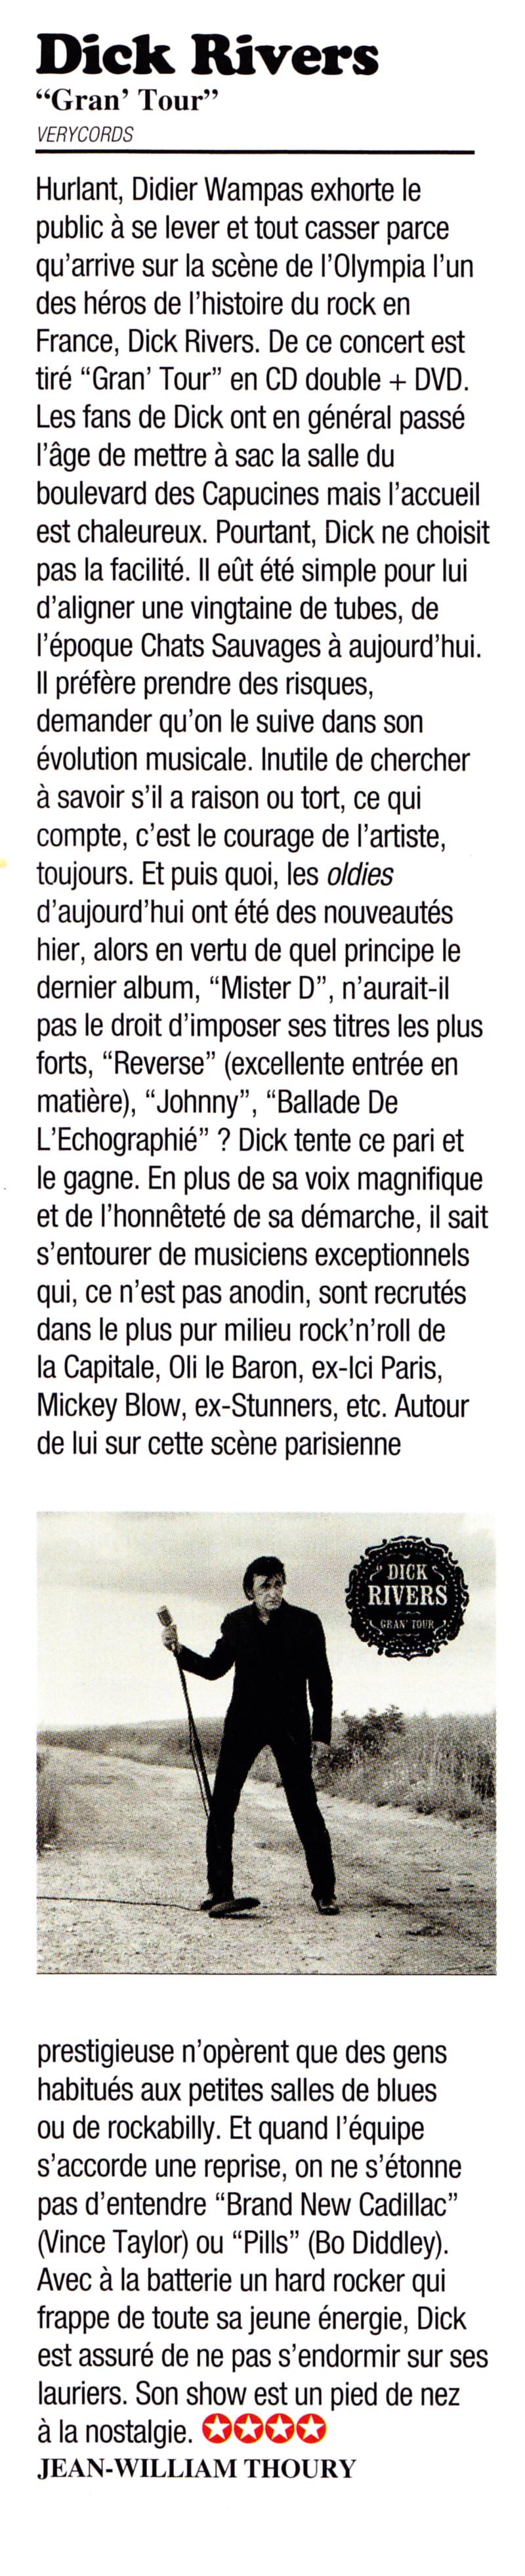 "DICK RIVERS ""Mister D Tour"" 2011/2013 : compte rendu (Casino de Paris, Olympia, Noisy, Clamart) 12121508091515789310668656"